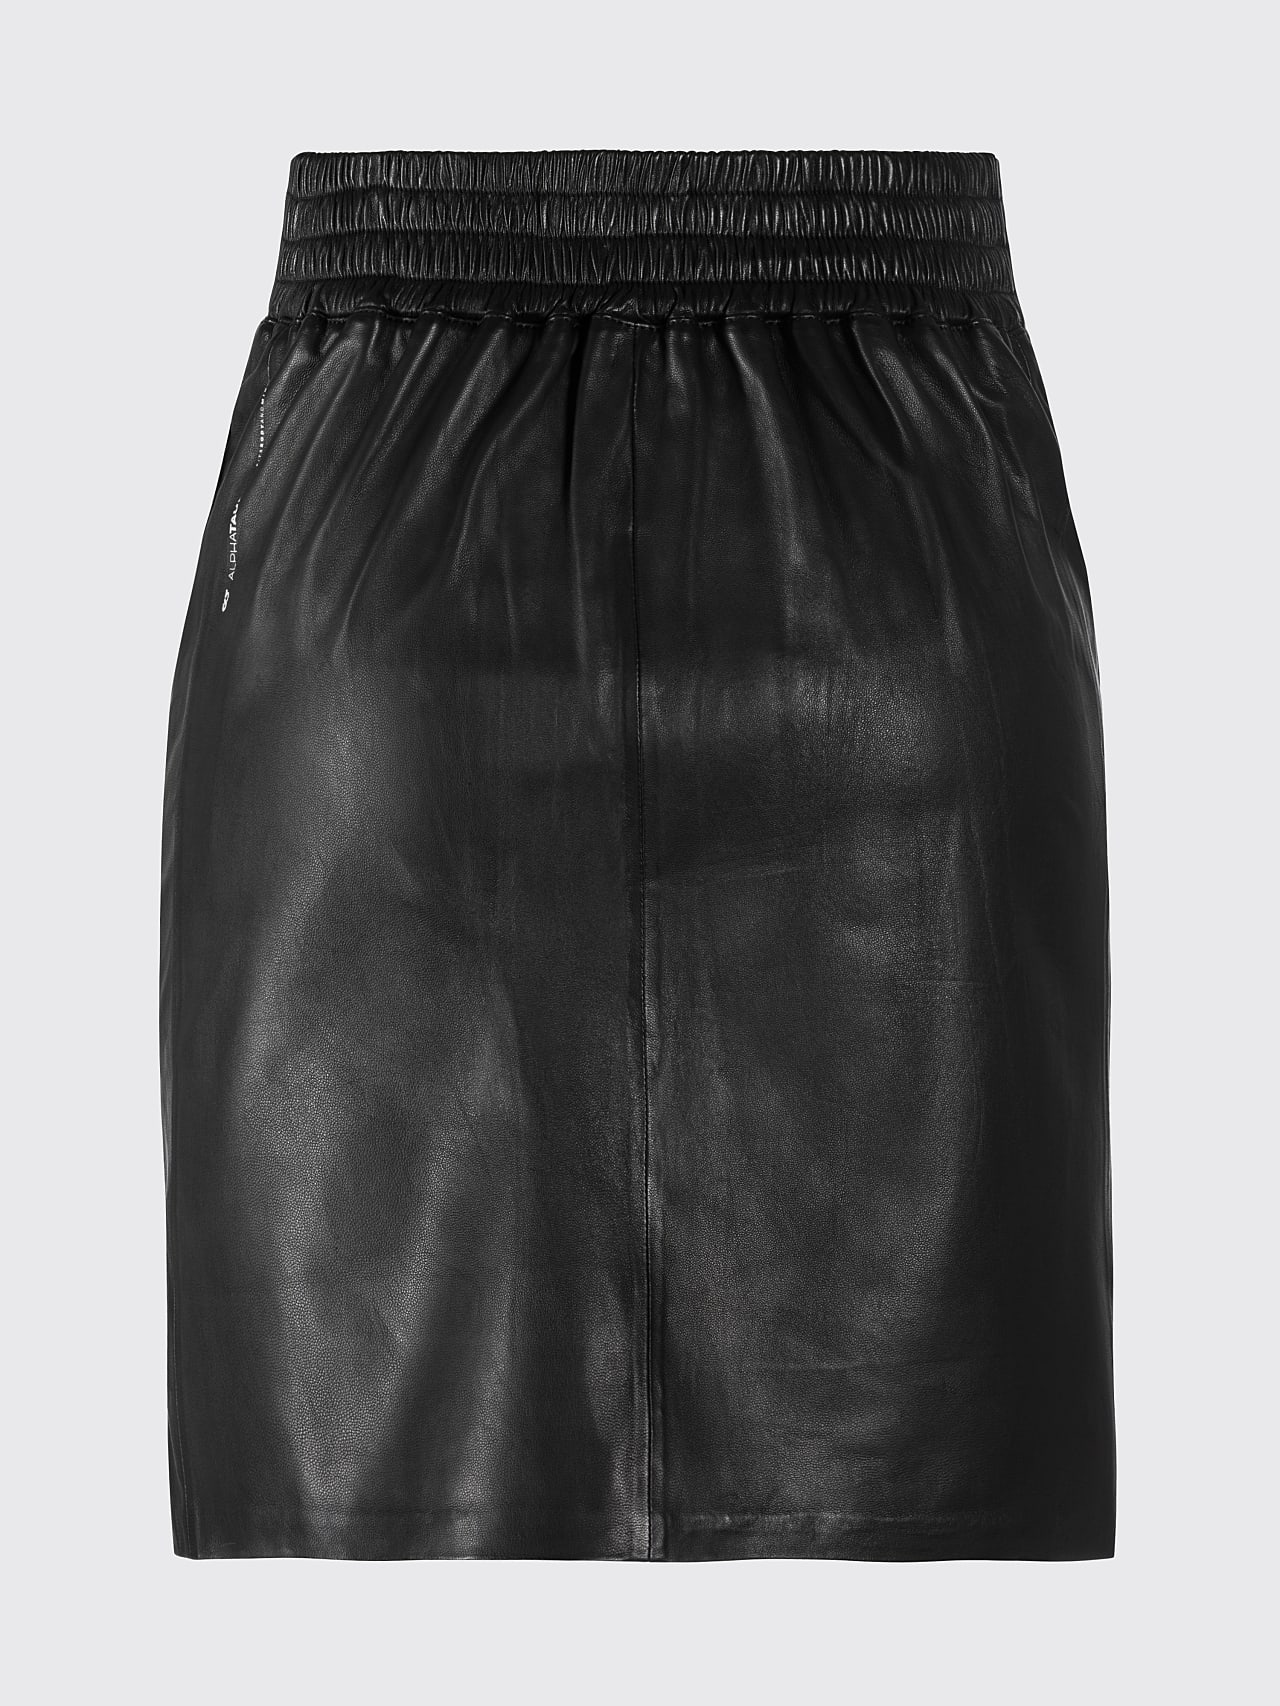 LEXSI V1.Y5.01 Leather Pencil Skirt black Left Alpha Tauri